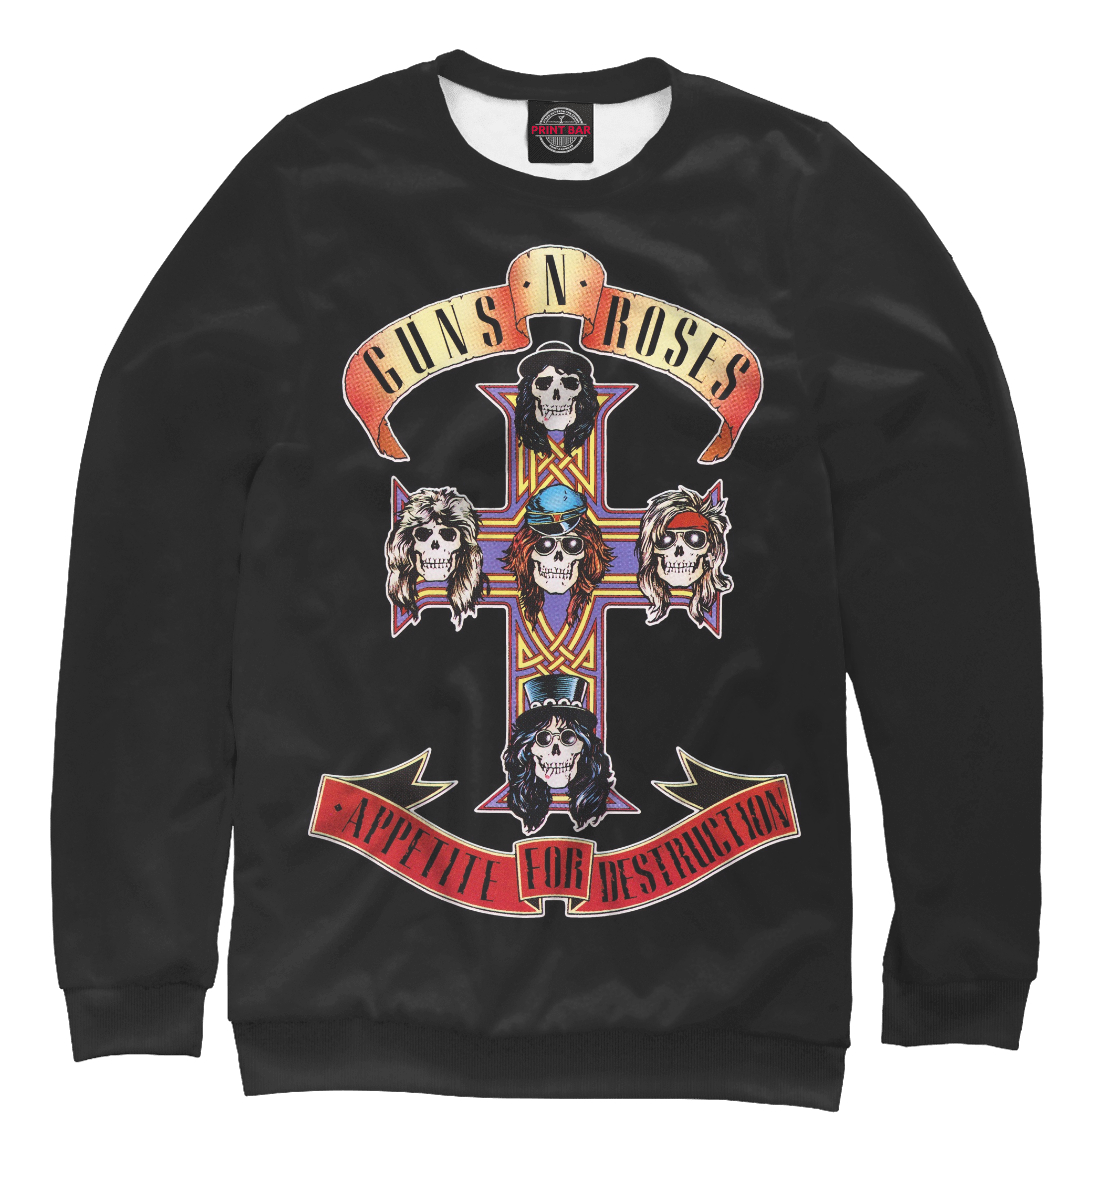 Купить Guns N' Roses, Printbar, Свитшоты, MZK-673682-swi-1